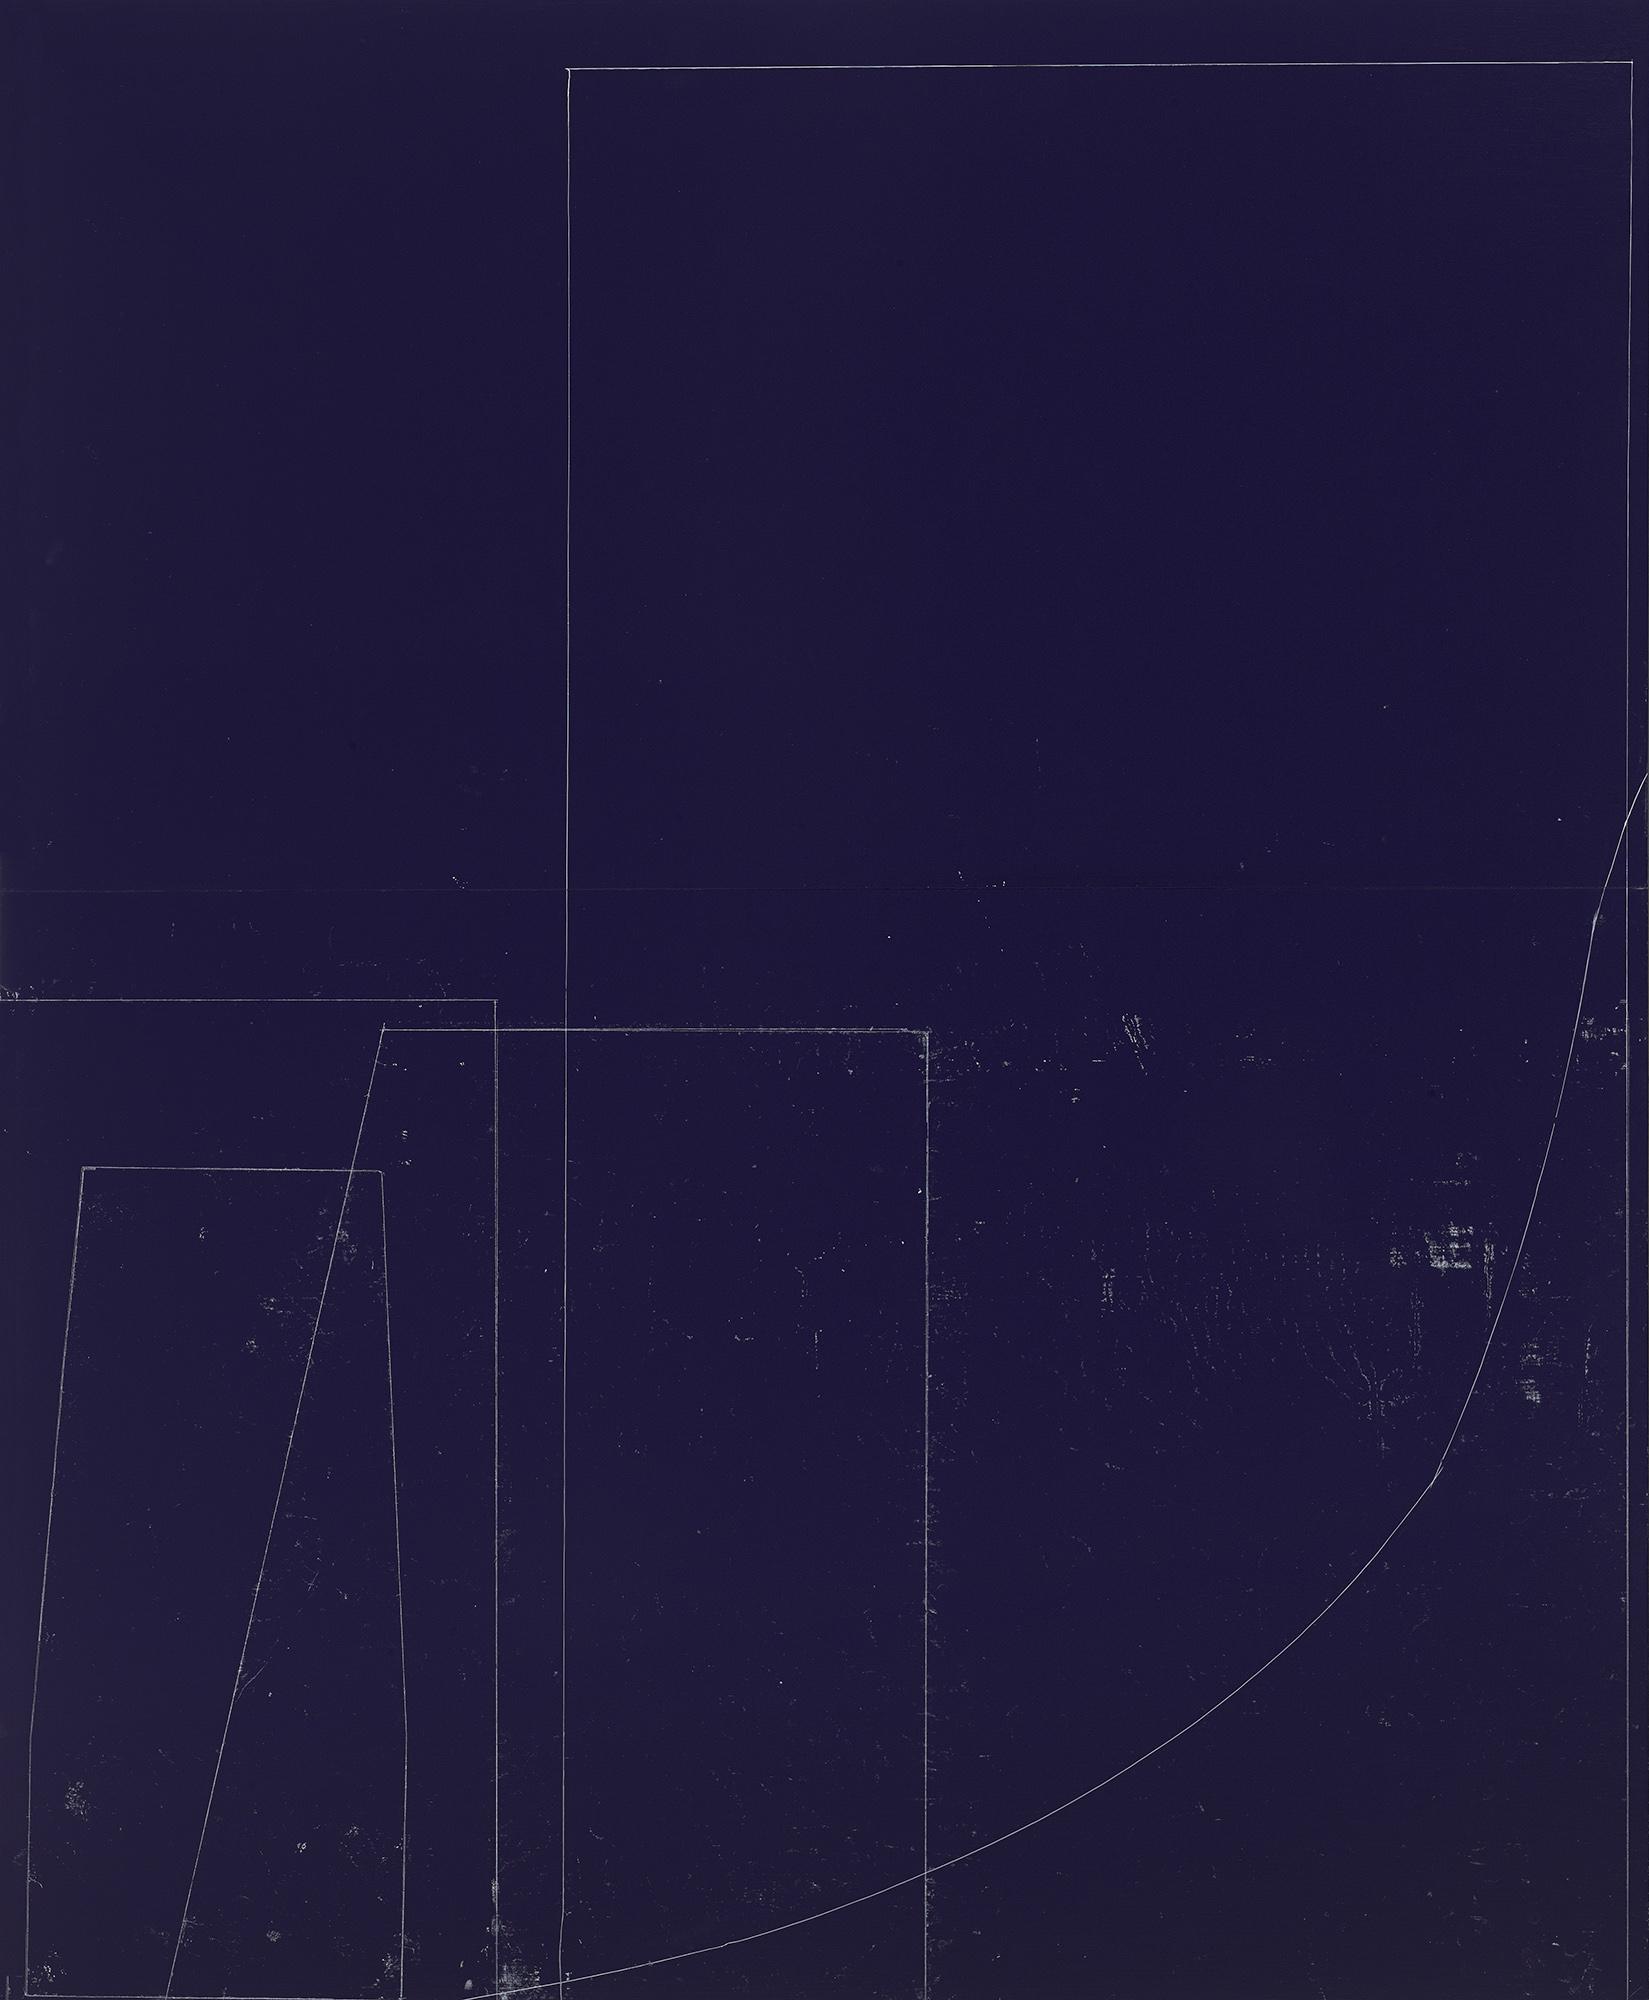 Kate Shepherd, 2016, Custom Curve, plane accumulation with tall one on purple oops.jpg